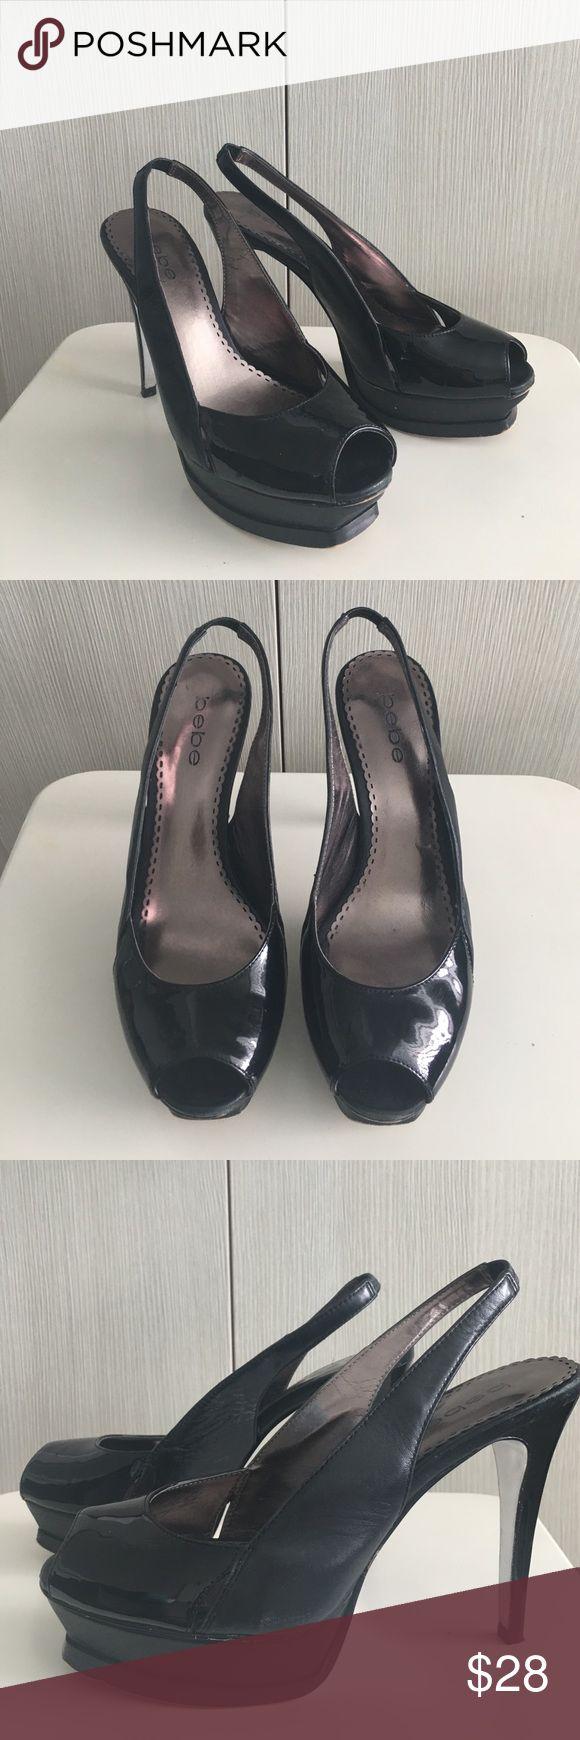 "Bebe wedge high heels black Bebe wedge high heels in black. Mix of matte and glossy leather top. 1"" wedge bottoms, 4.5"" heels. In good condition. bebe Shoes Heels"